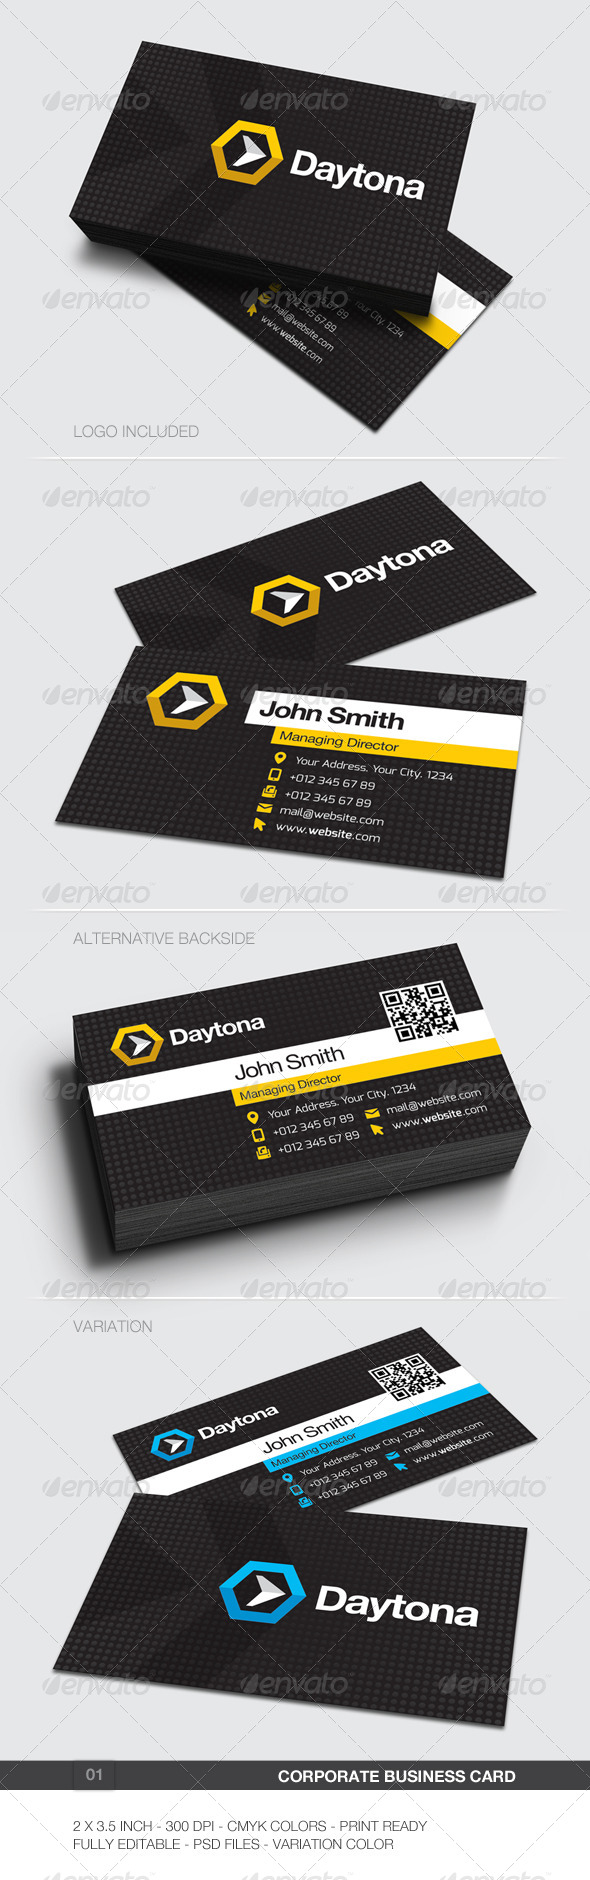 Corporate Business Card - 01 - Corporate Business Cards